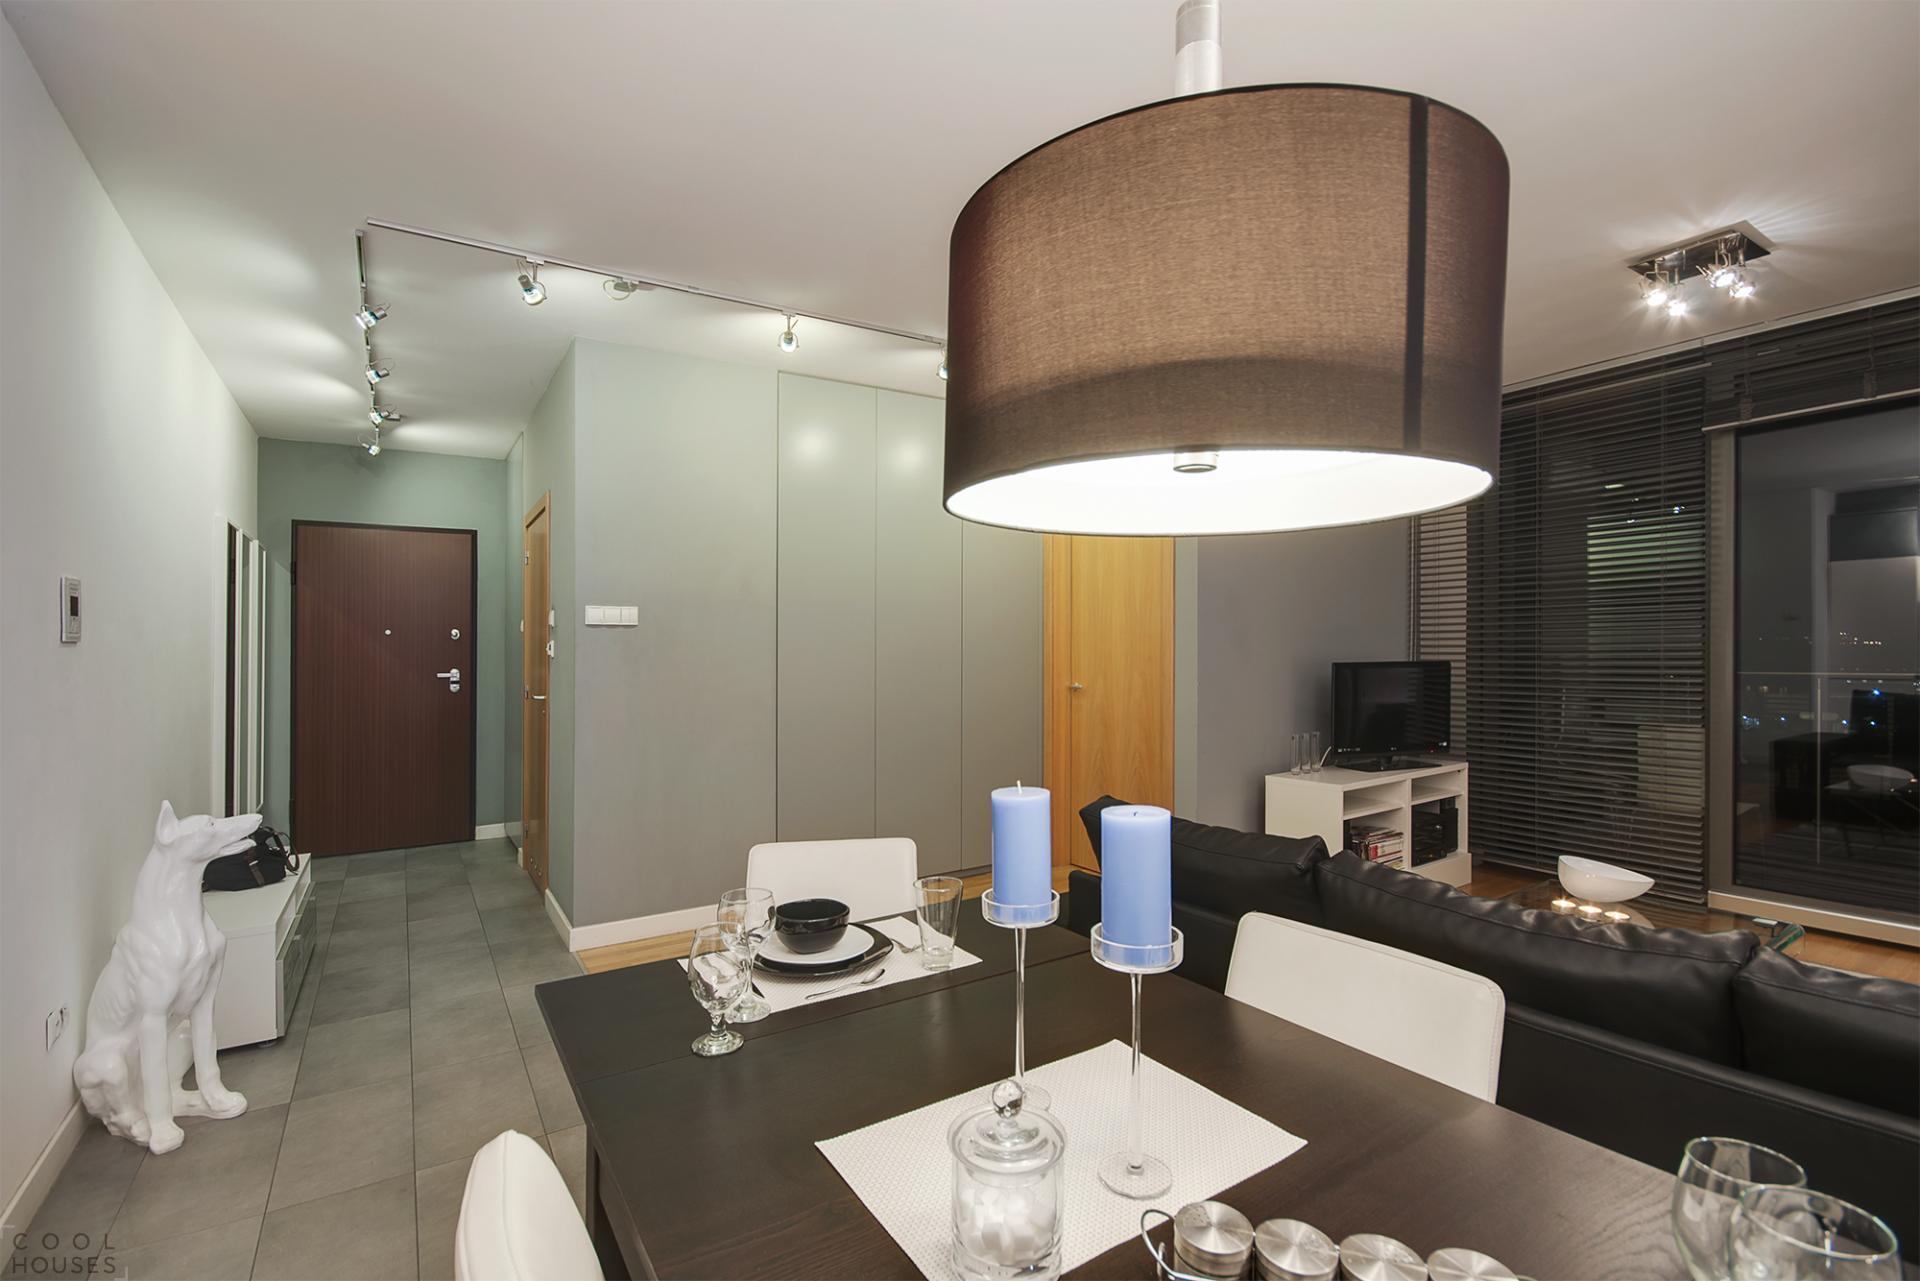 Интерьер небольших квартир в жилом комплексе Wislane Tarasy Apartment